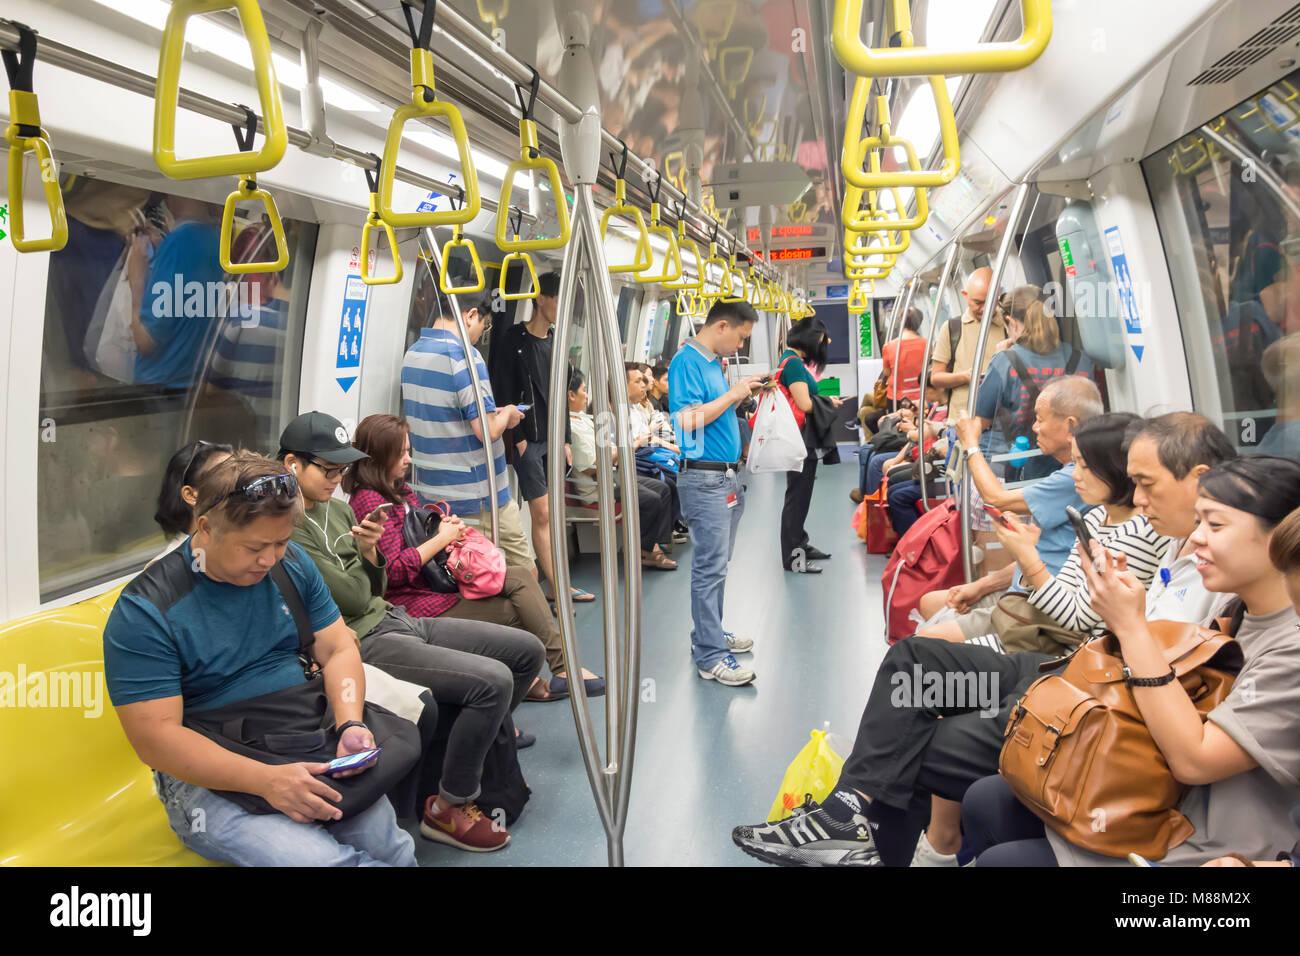 Carriage interior on Singapore Mass Rapid Transit (MRT), Serangoon, North-East Region, Singapore - Stock Image